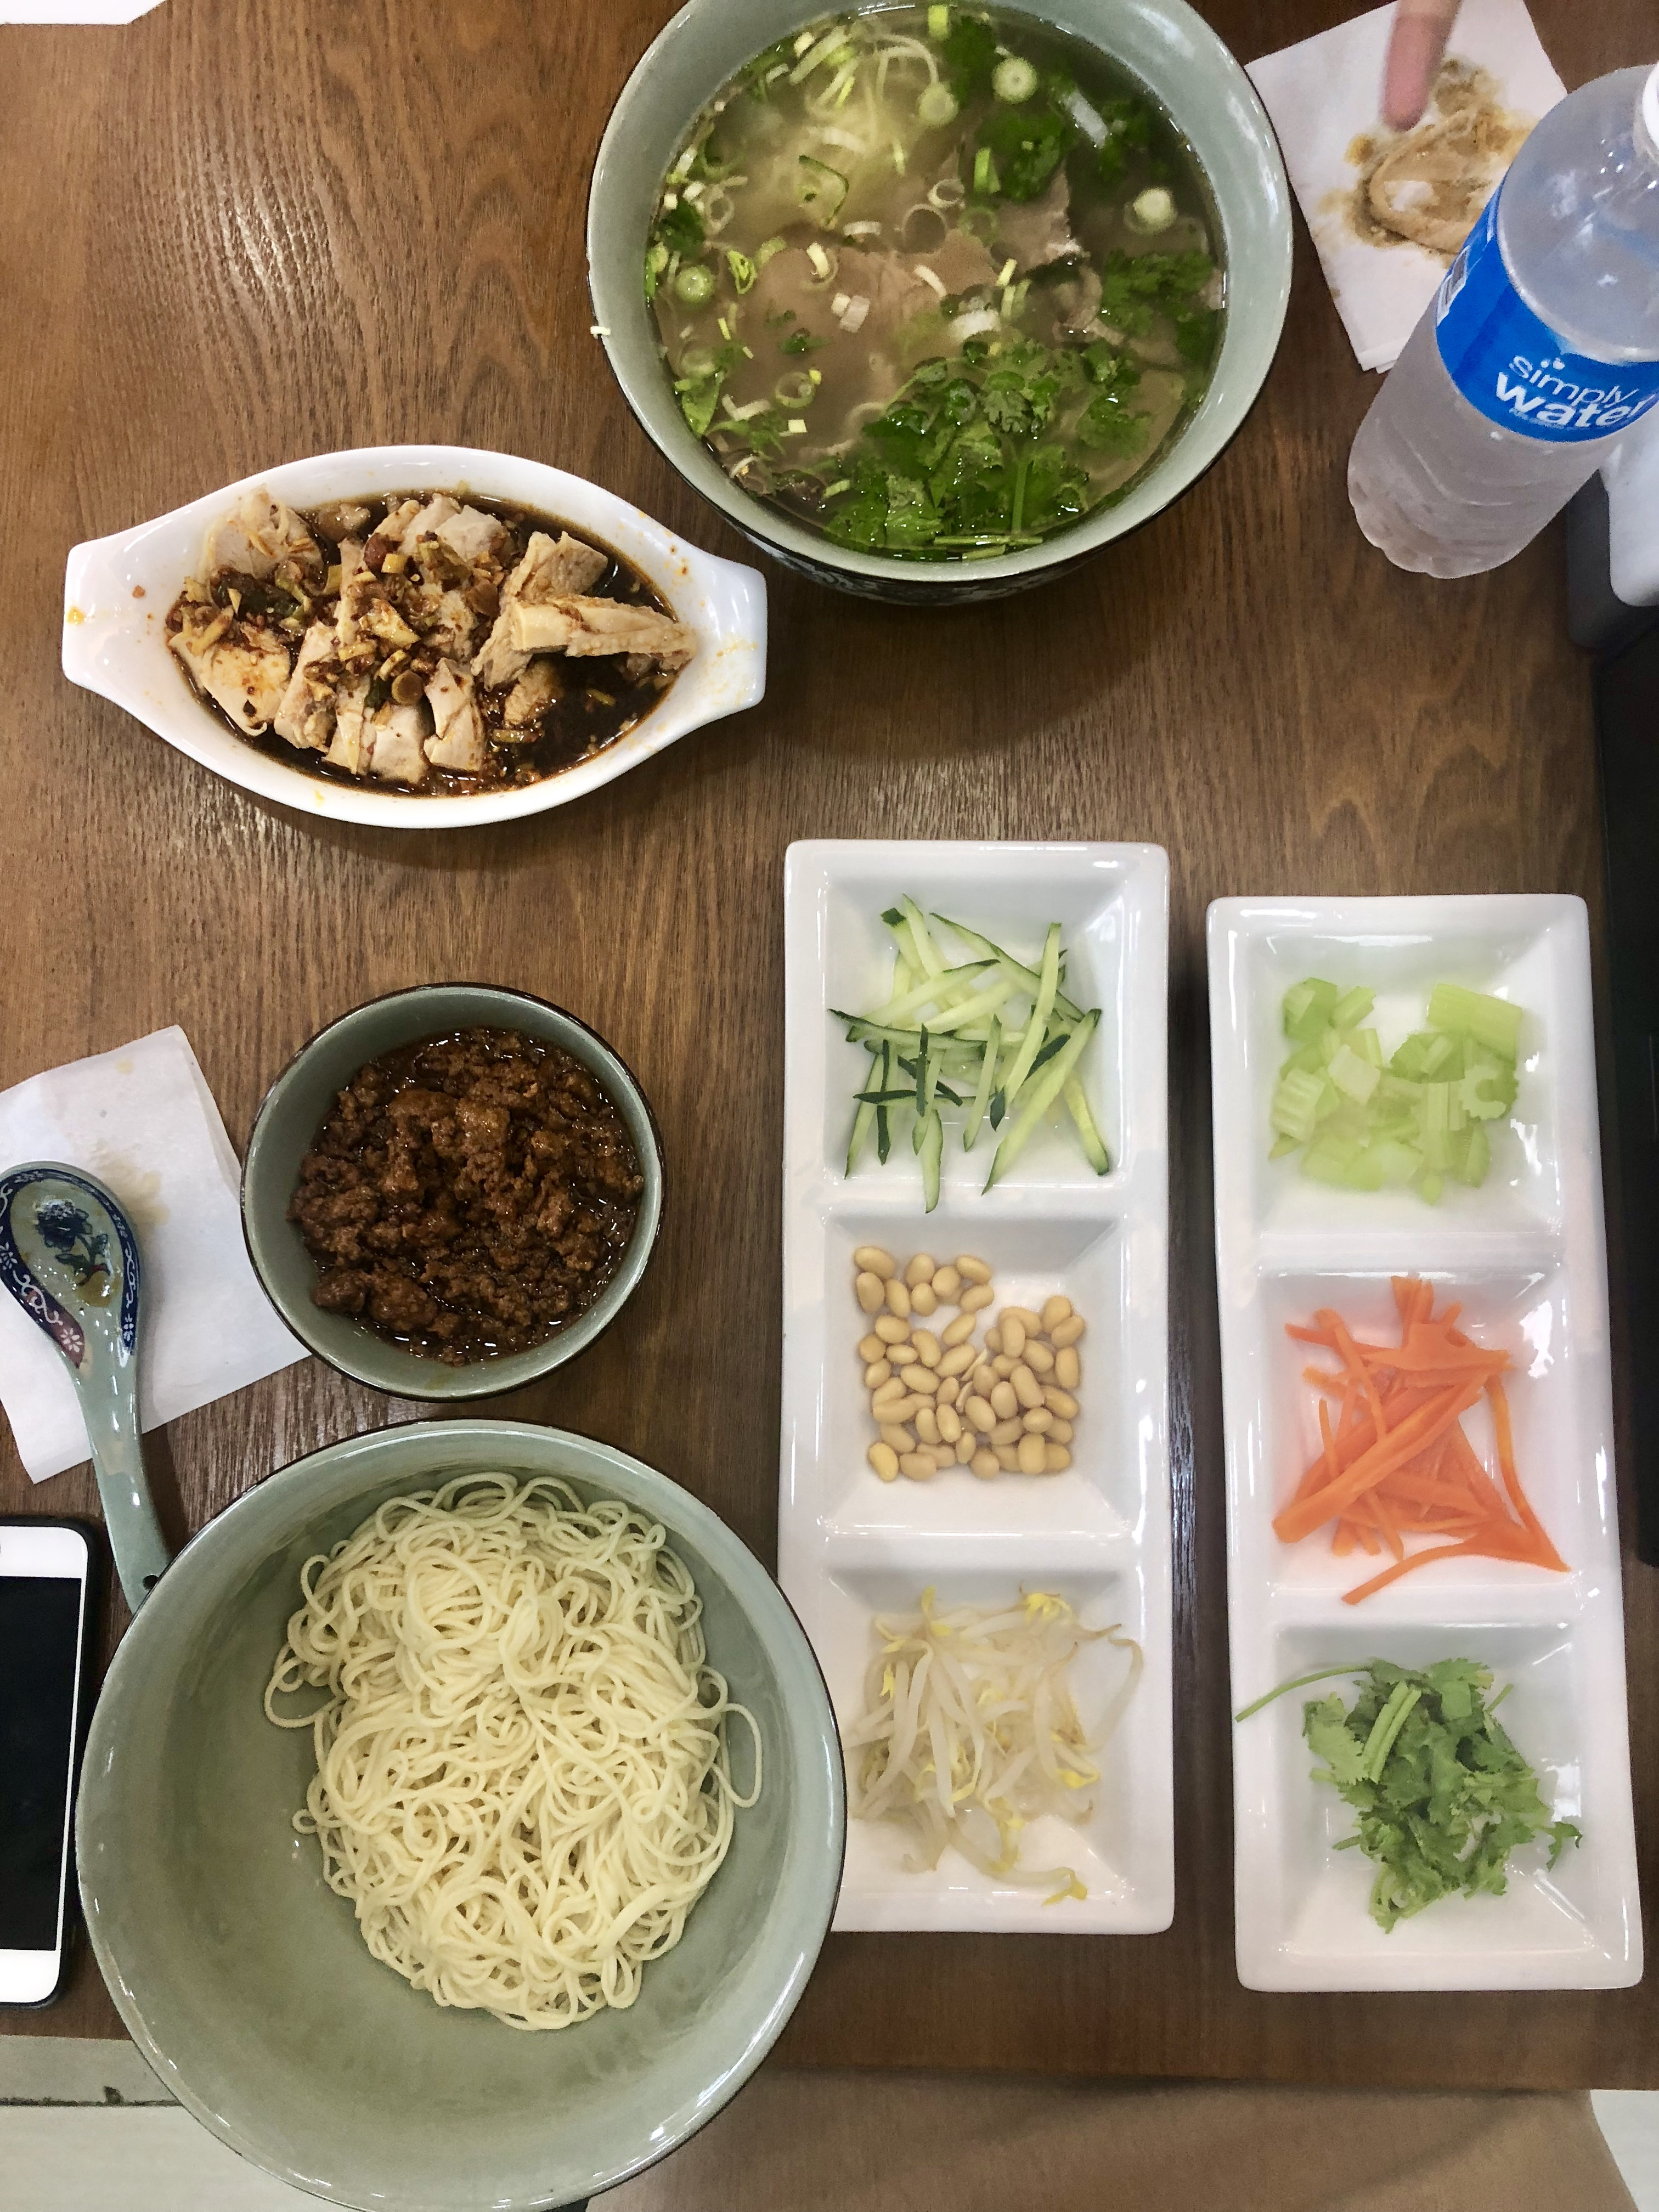 Yi_Zun_Beef_Noodles_Flatlay